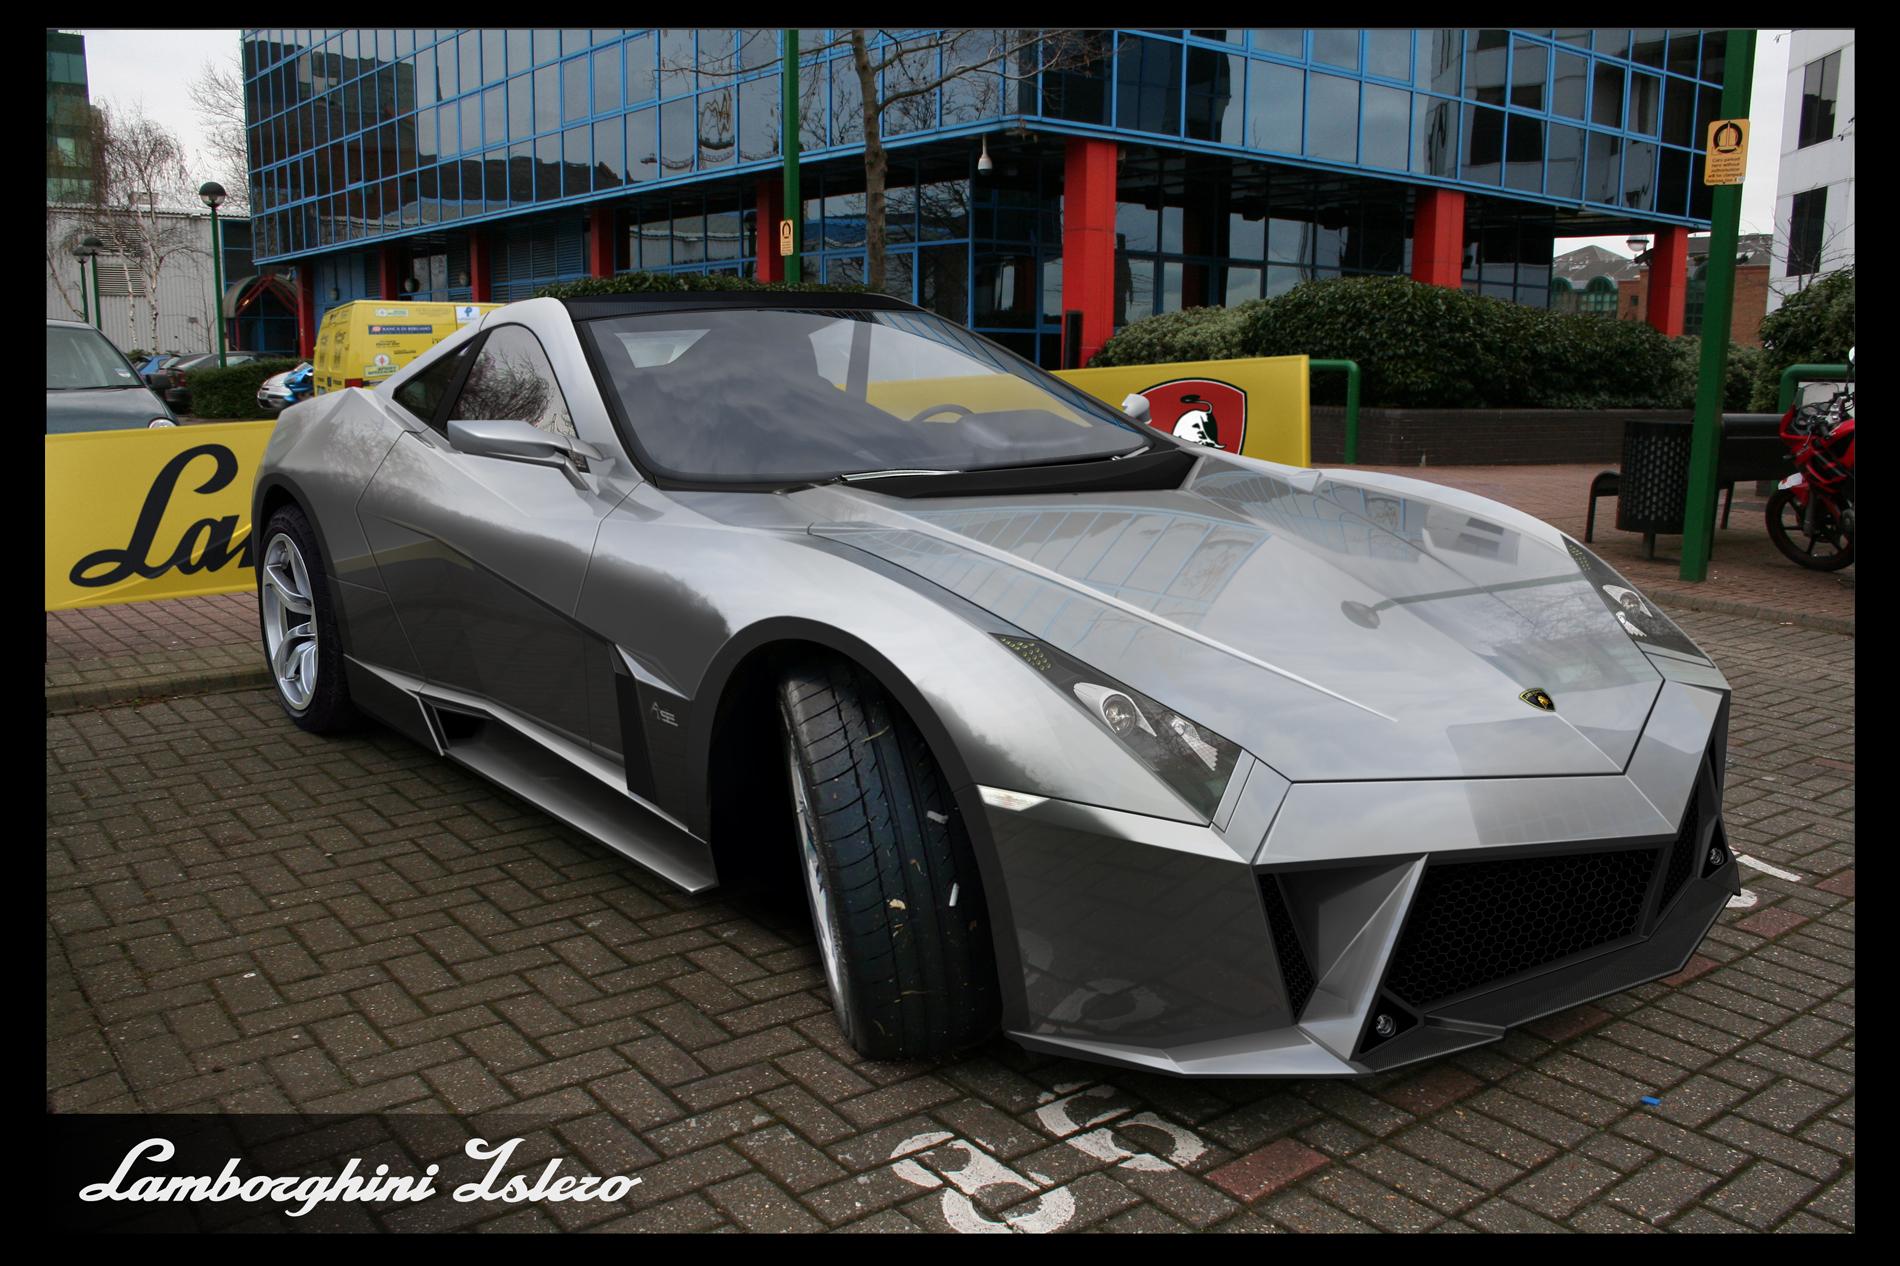 Lamborghini Islero by agespoom